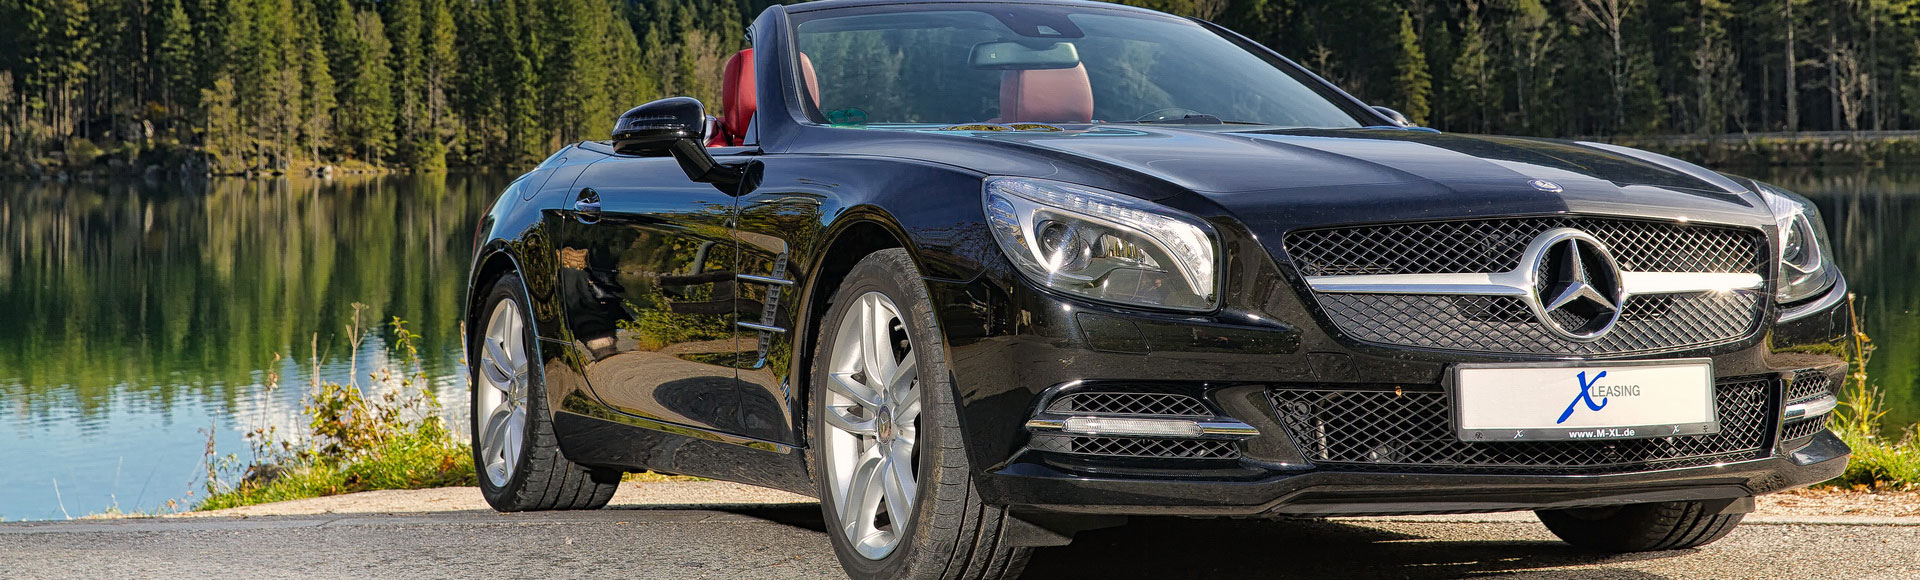 Mercedes Benz SL 500 2012 Herbst 35044